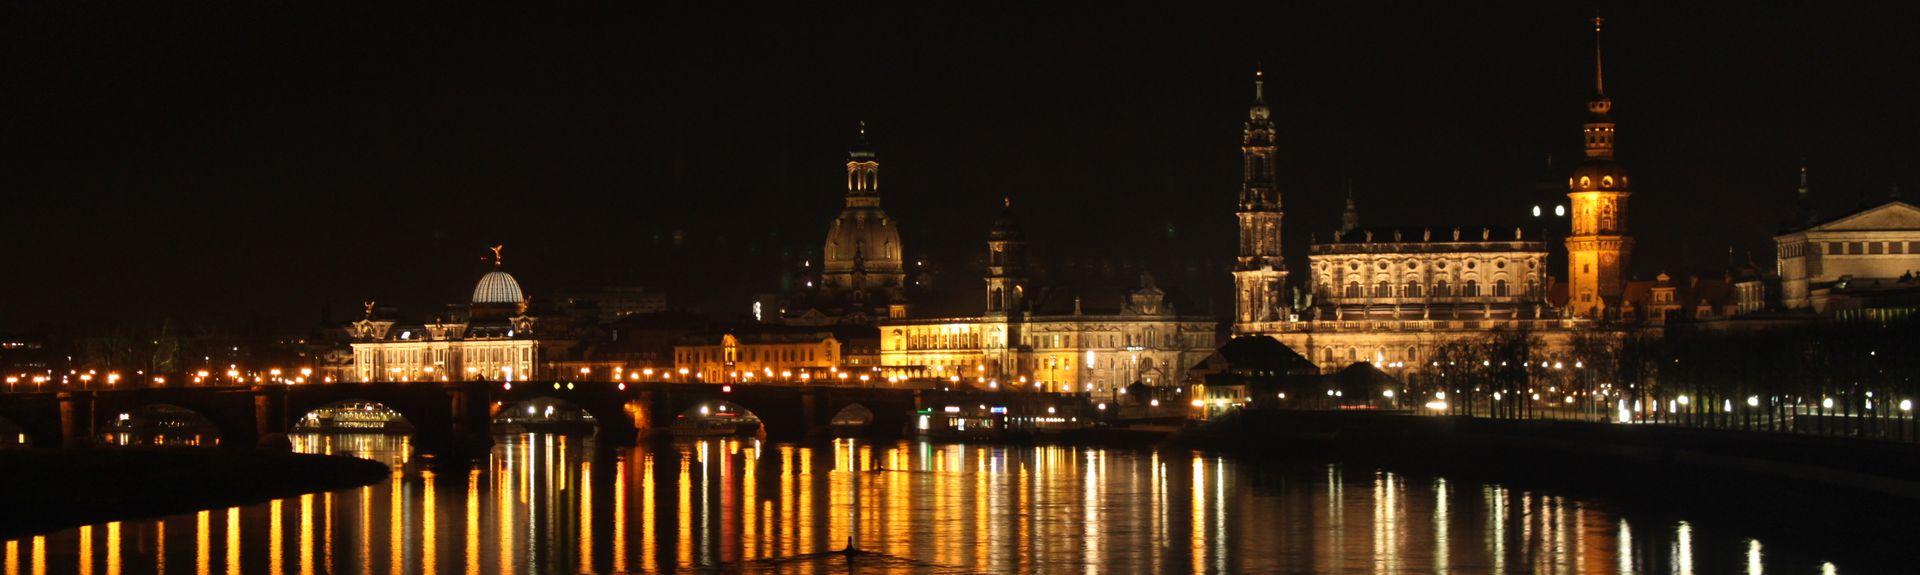 Niederpoyritz, Dresden, Germany